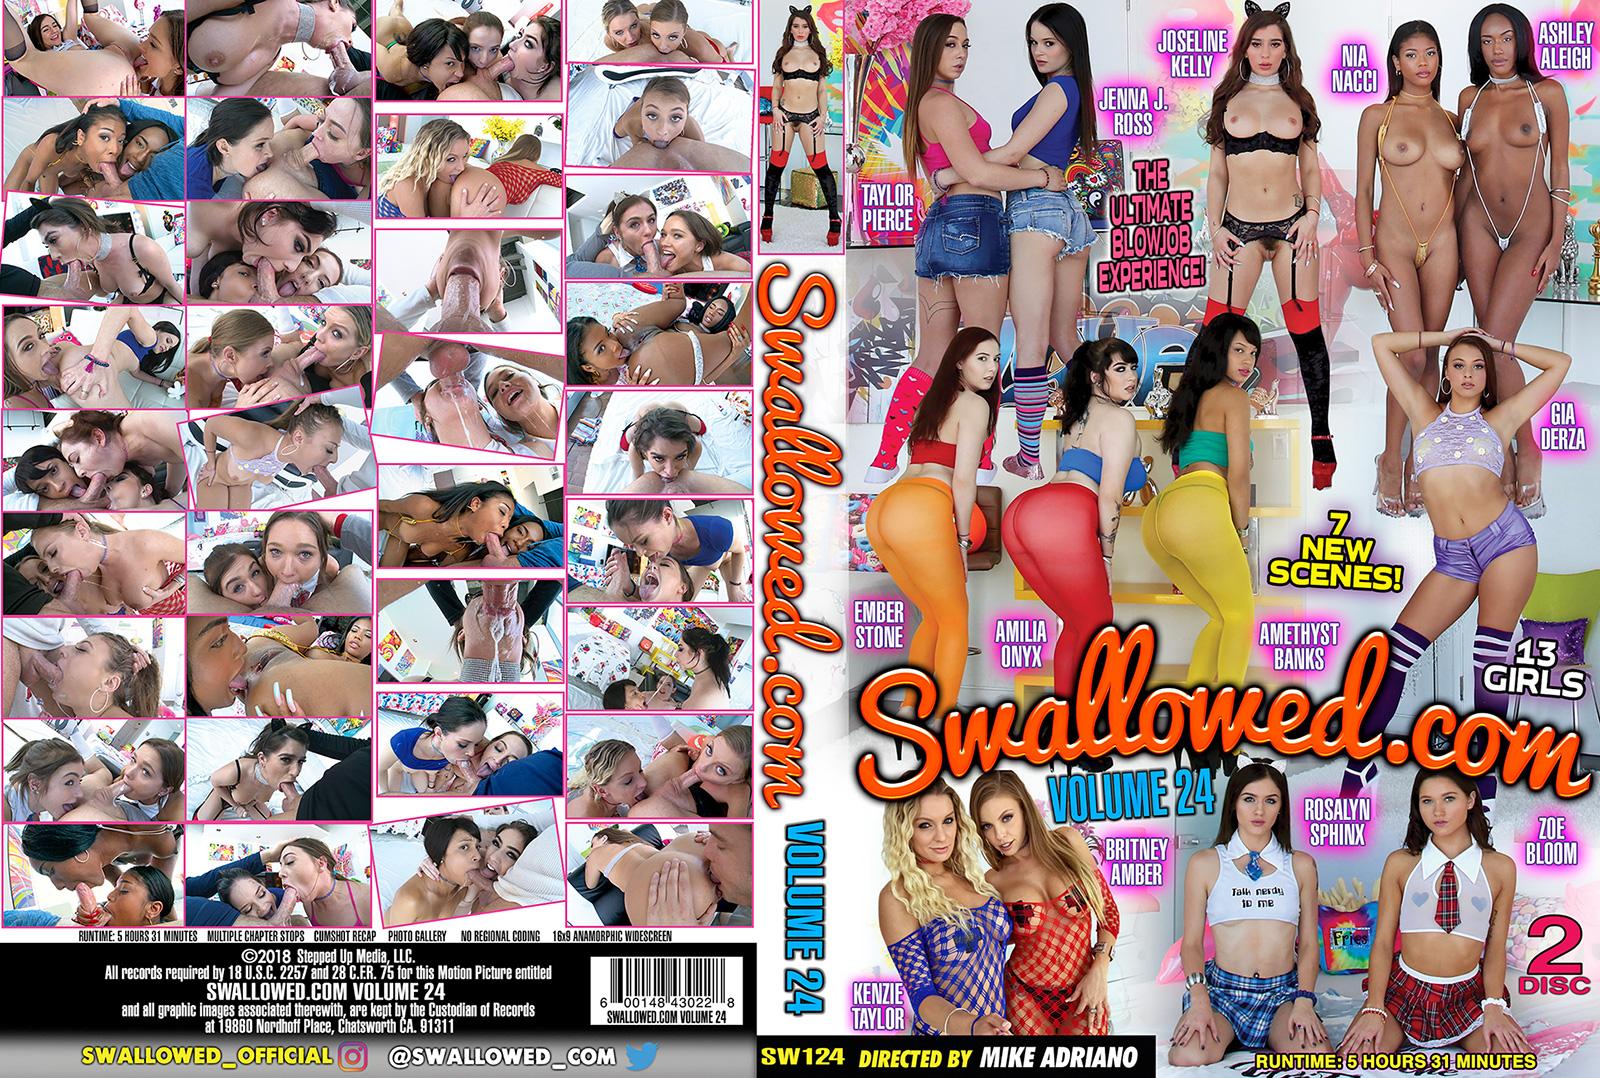 Swallowed Vol 24 DVD